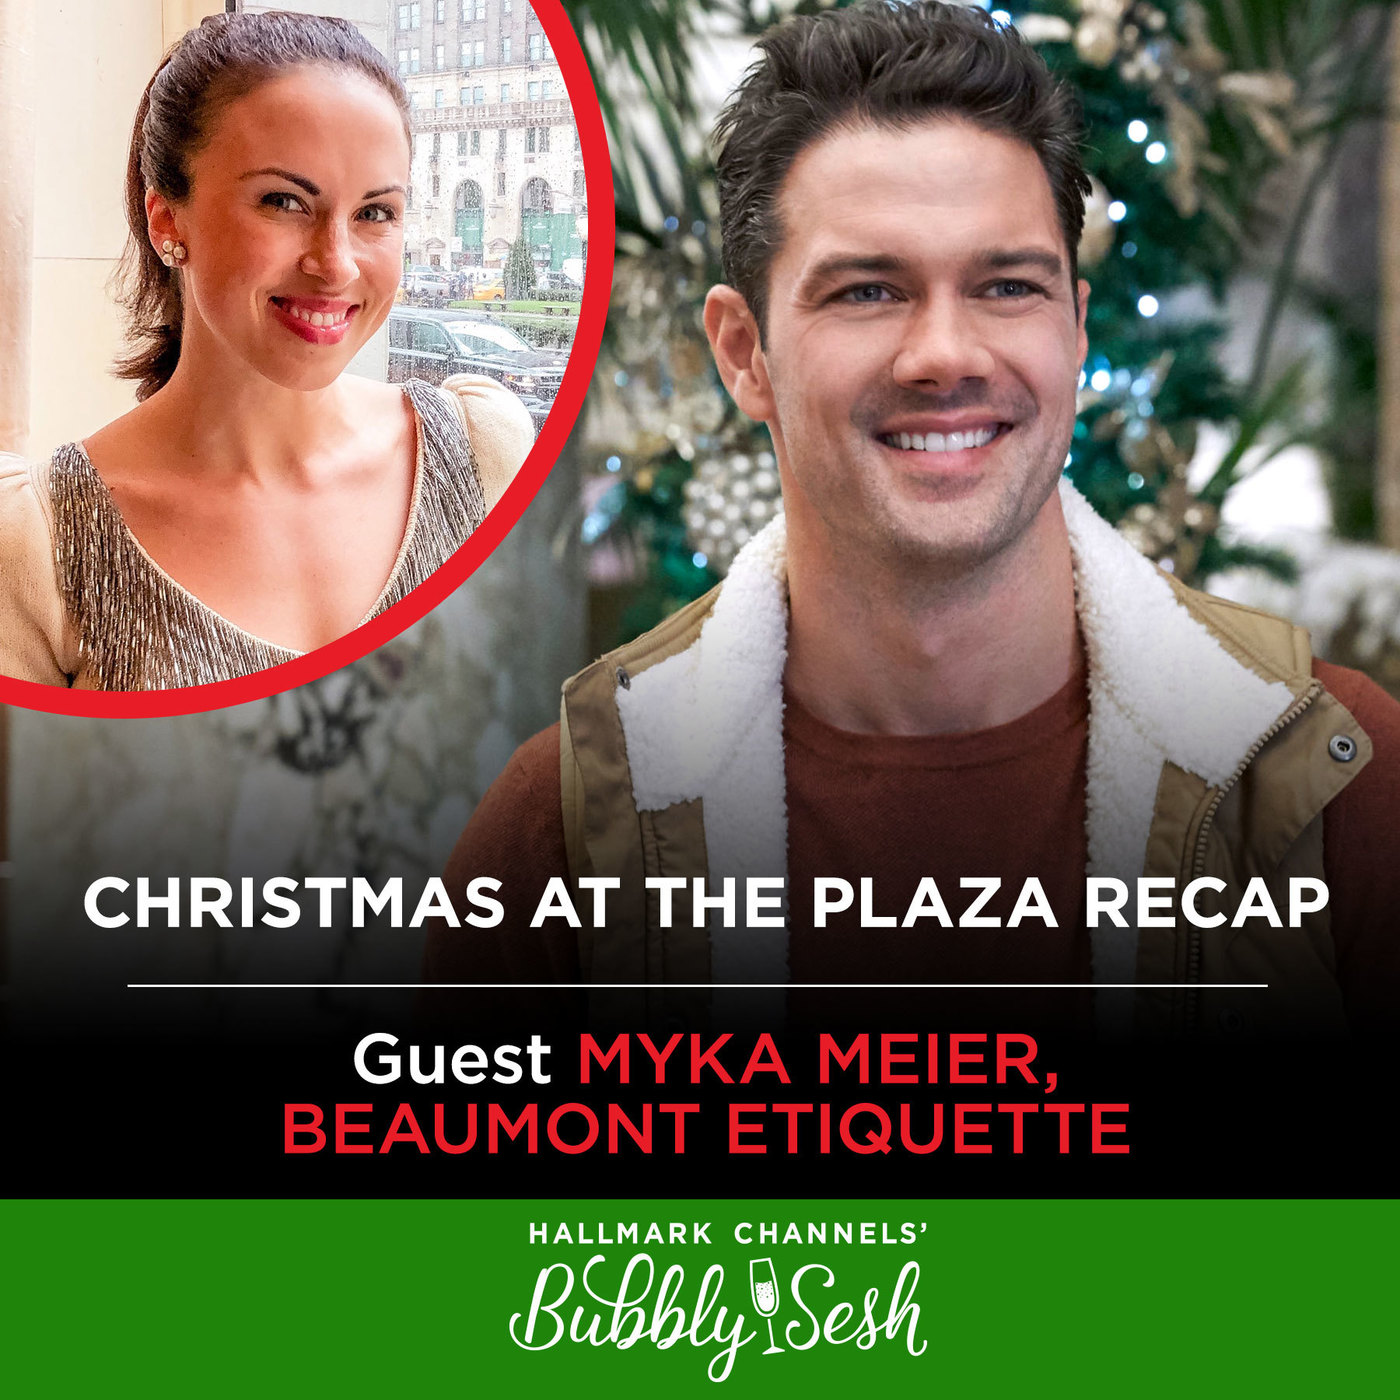 Christmas at the Plaza Recap with Myka Meier, Beaumont Etiquette